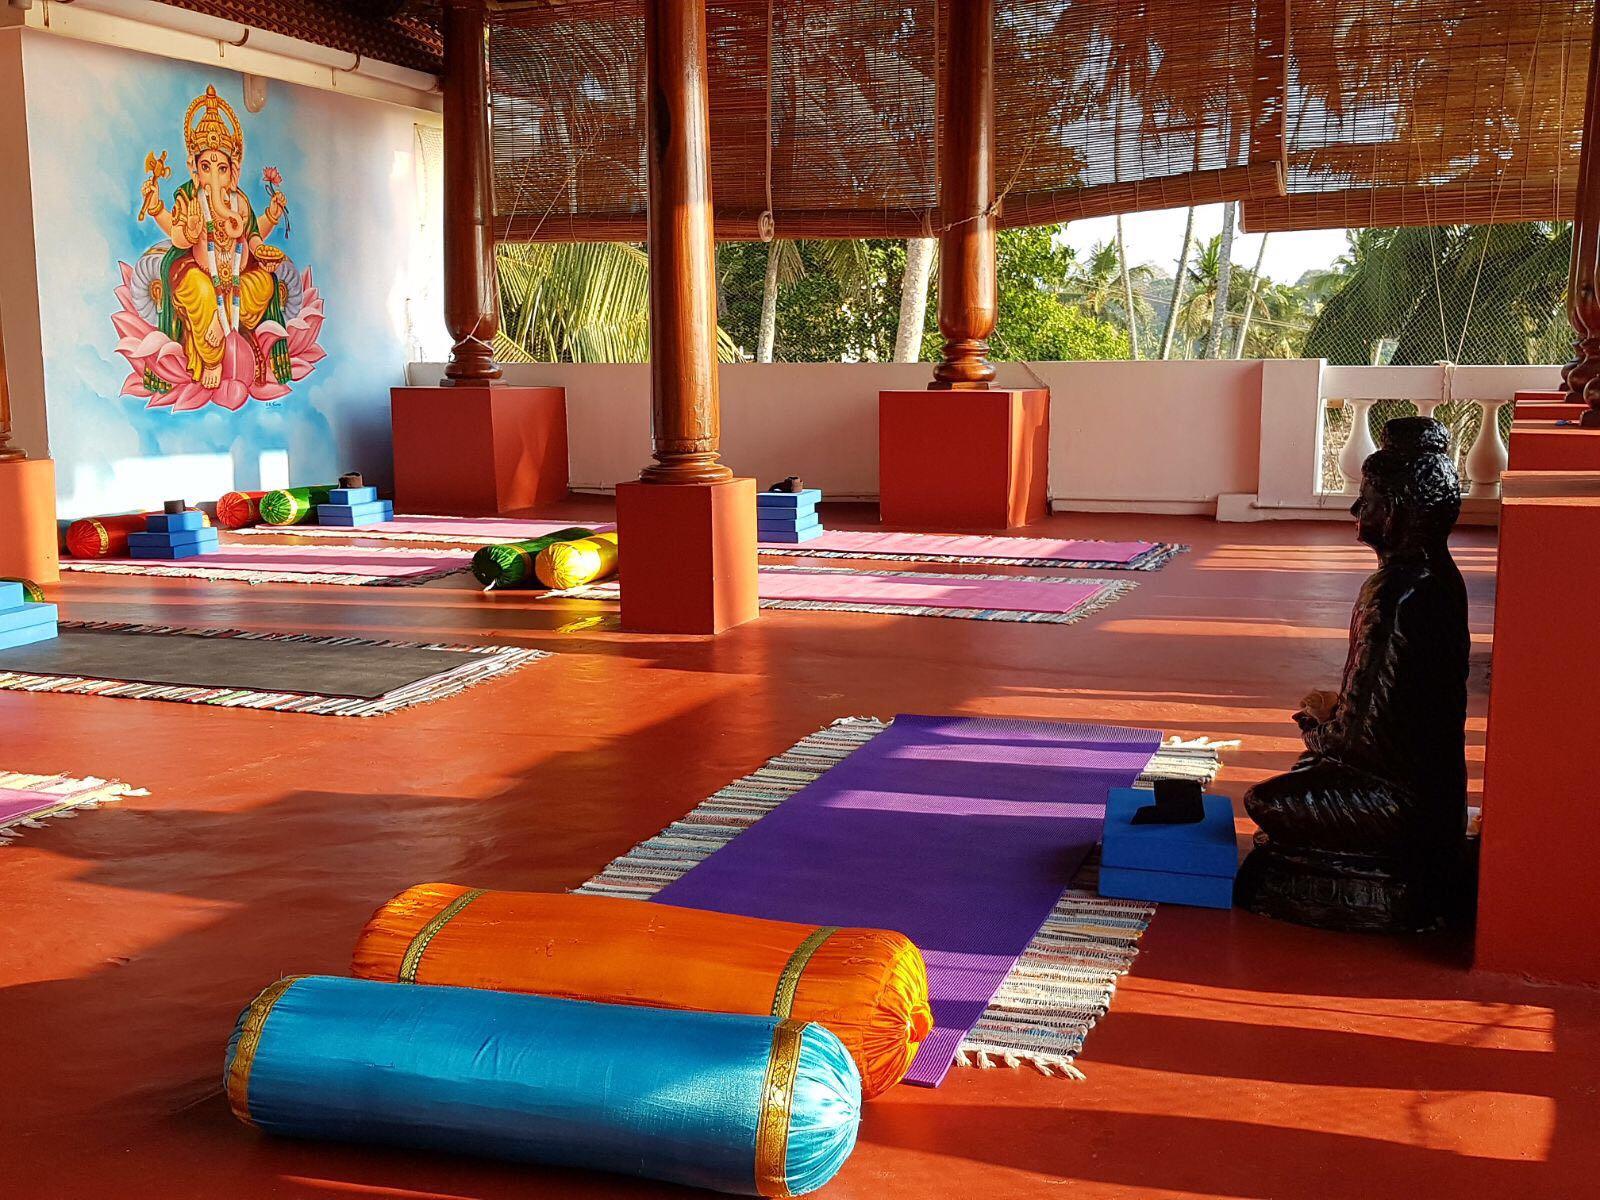 Palm Tree Yoga Kerala, India – Yoga Retreat 2022